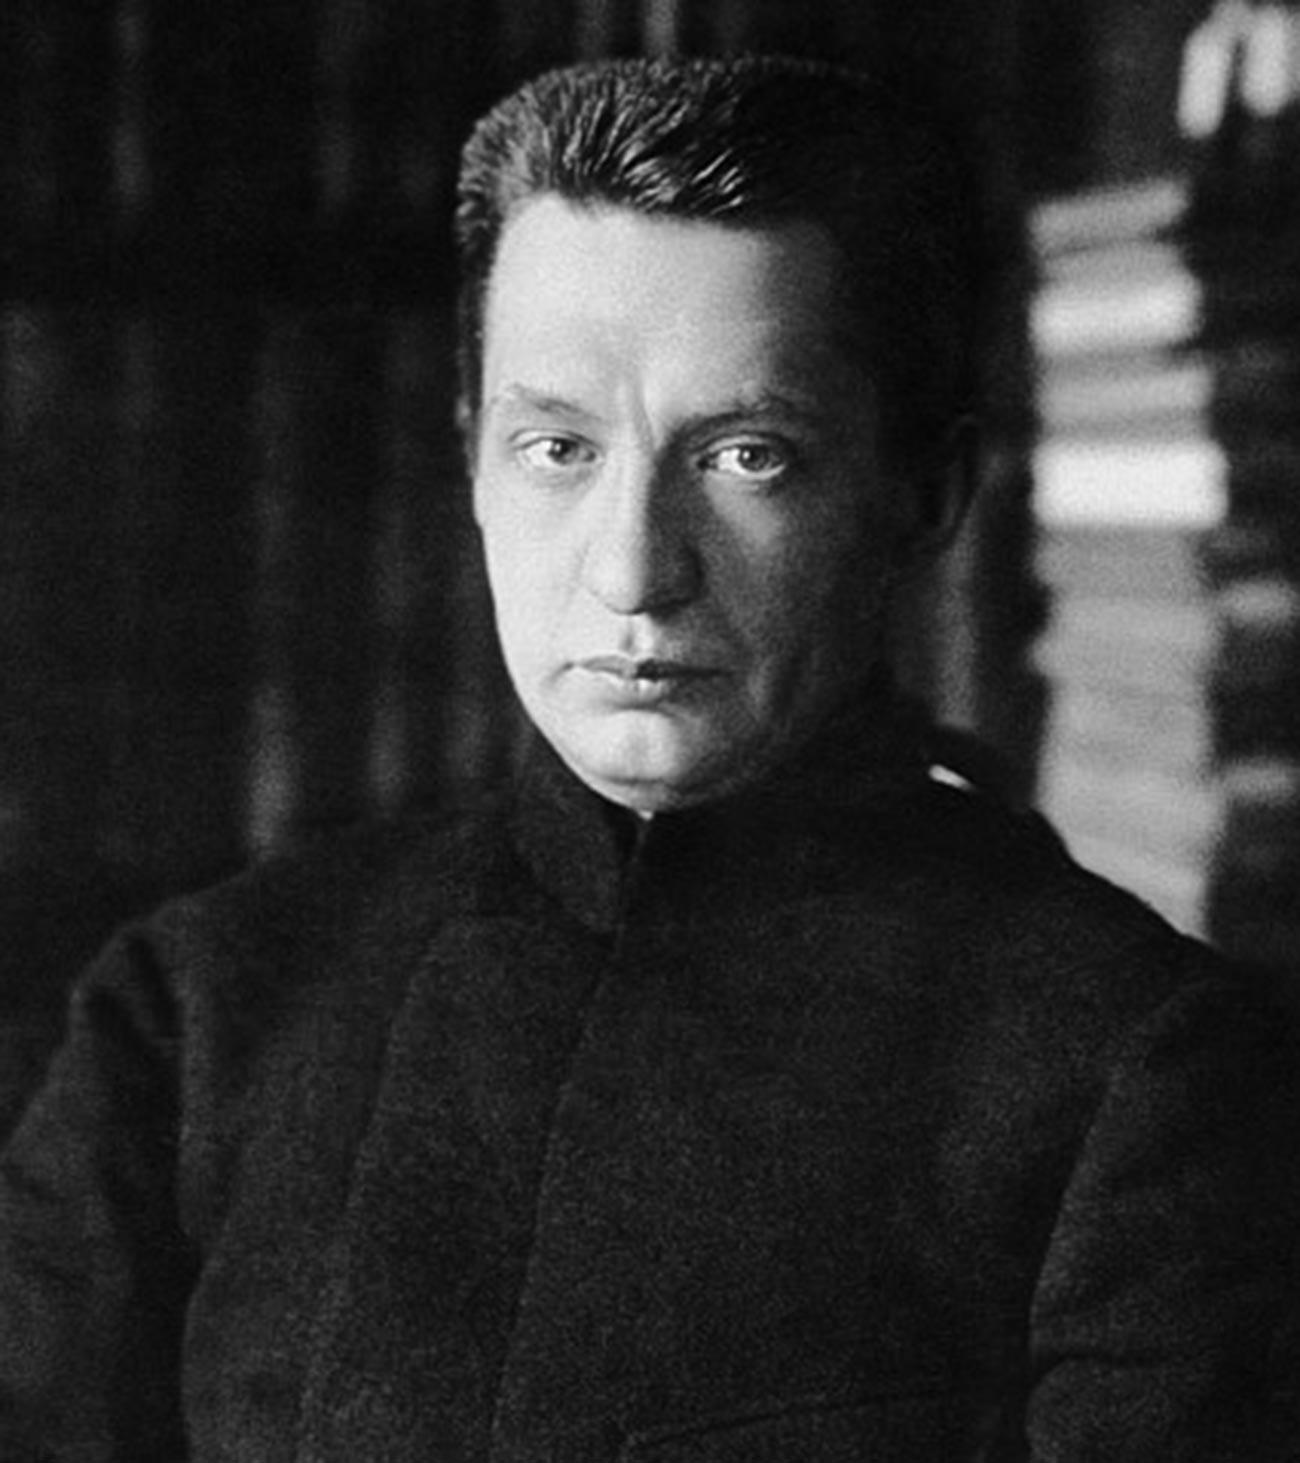 Alexander Kerensky, photographed by Karl Bulla